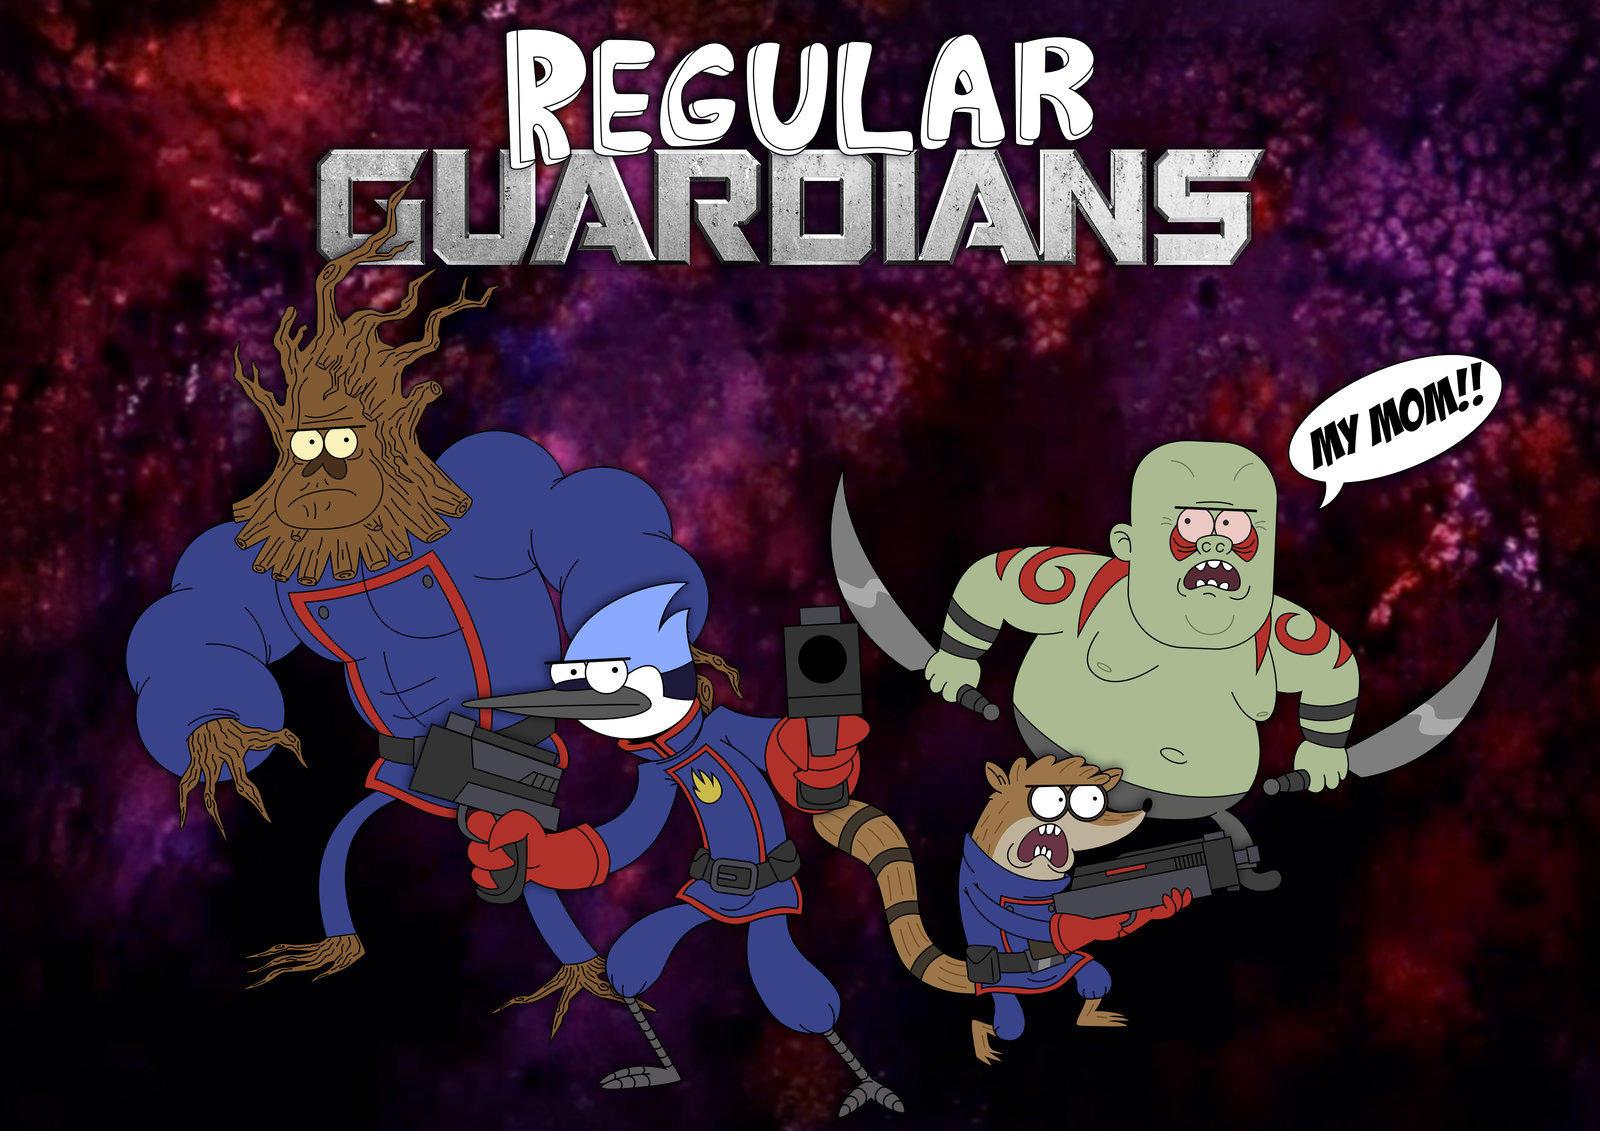 Moving Gravity Falls Wallpapers Regular Guardians Of The Galaxy Guardians Of The Galaxy